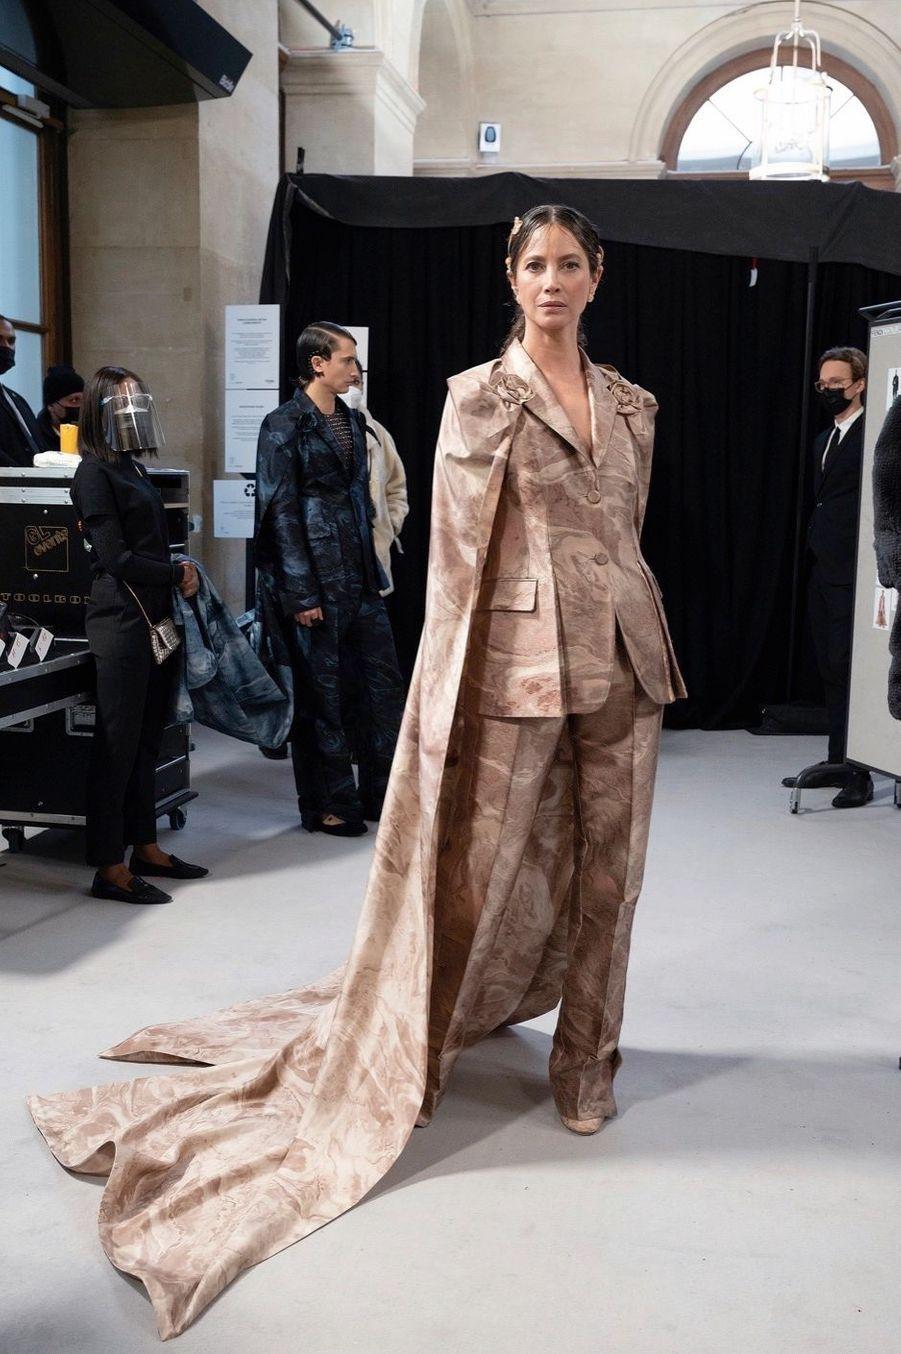 Le supermodel Christy Turlington comme une statue de marbre de la Galleria Borghese.